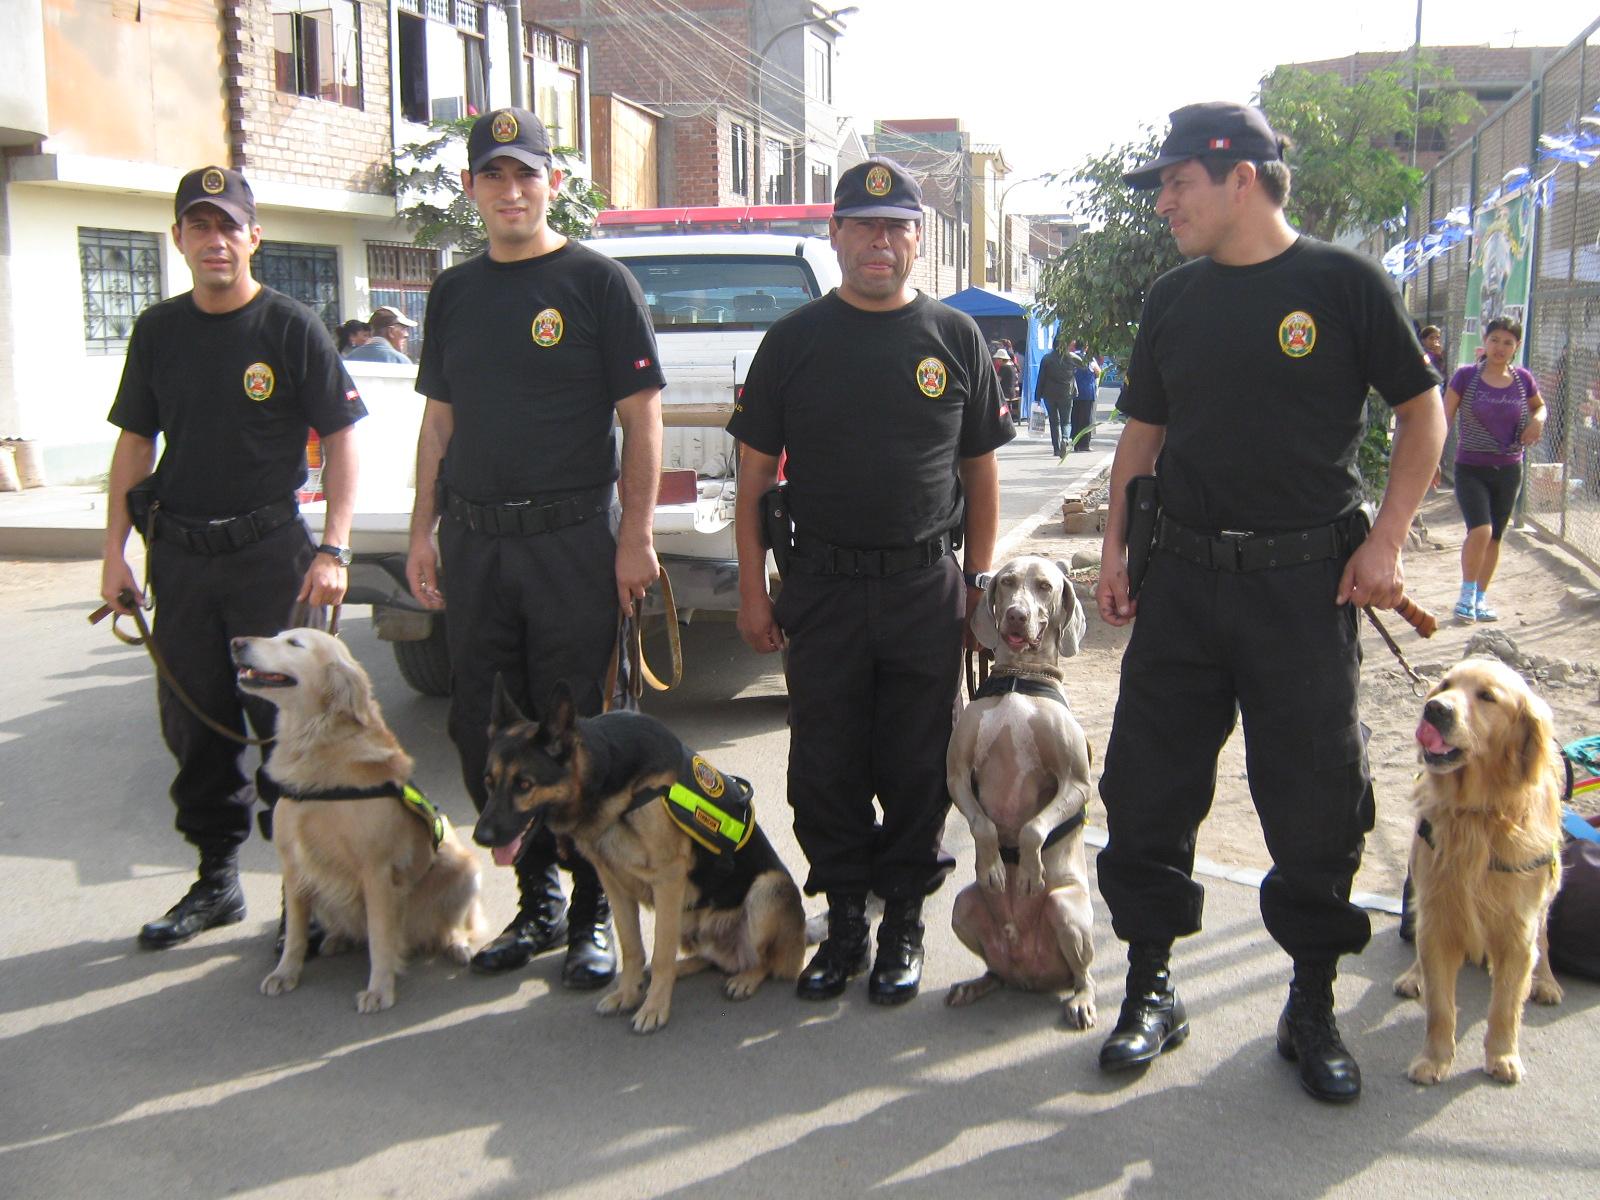 Departamento de la policia canina policia canina - Oficina del policia ...